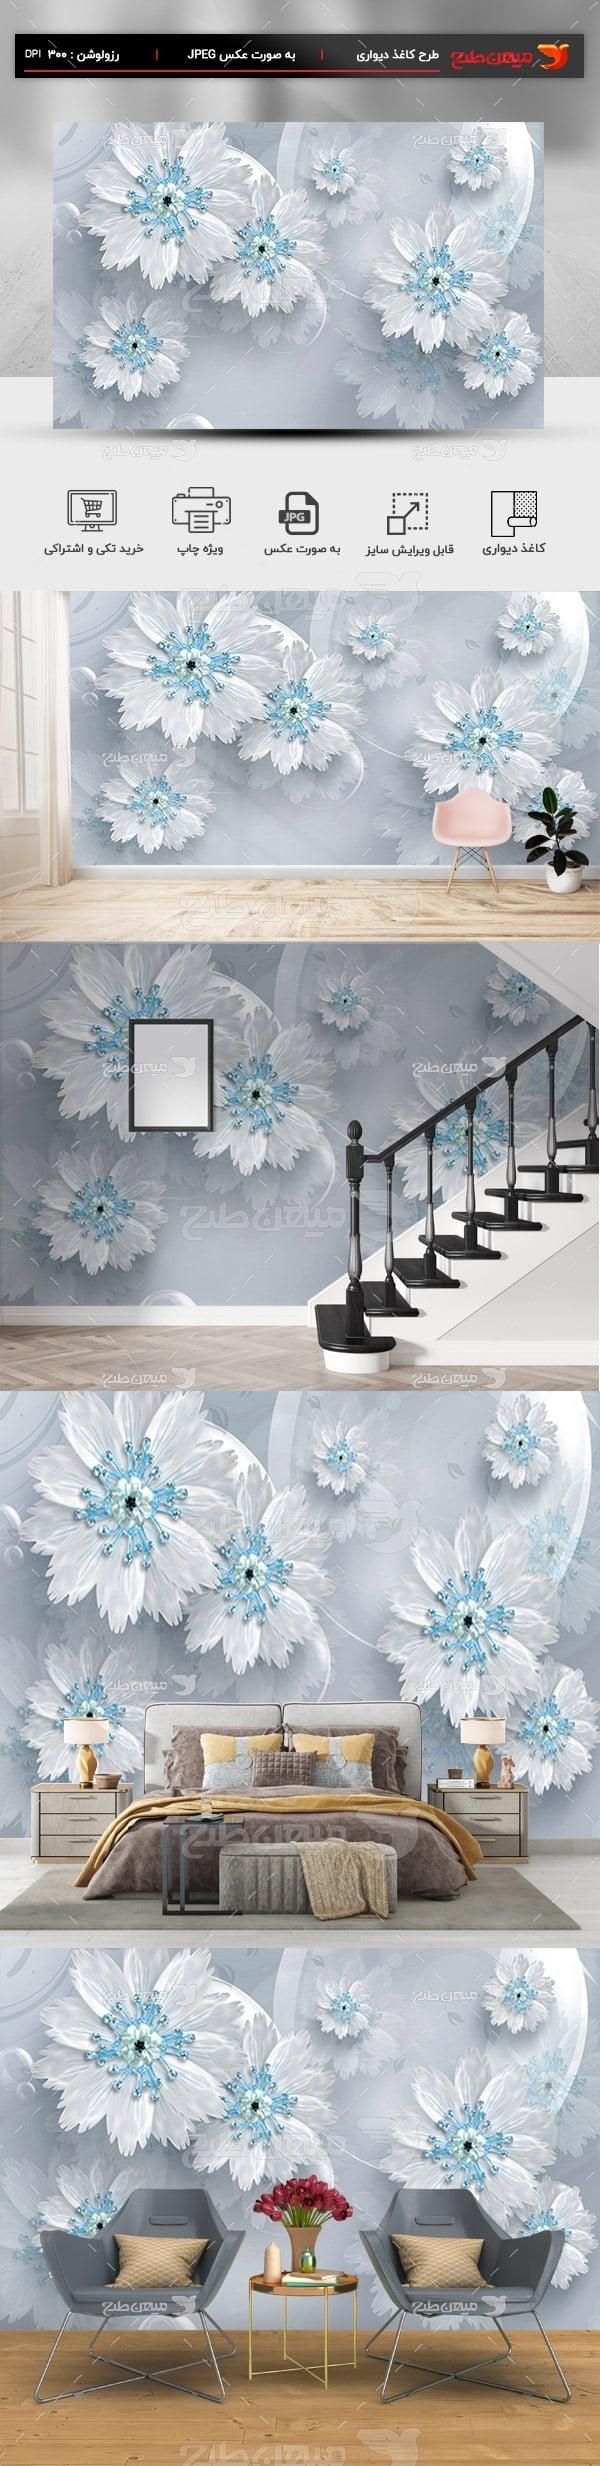 پوستر کاغذ دیواری سه بعدی گل سفید و آبی